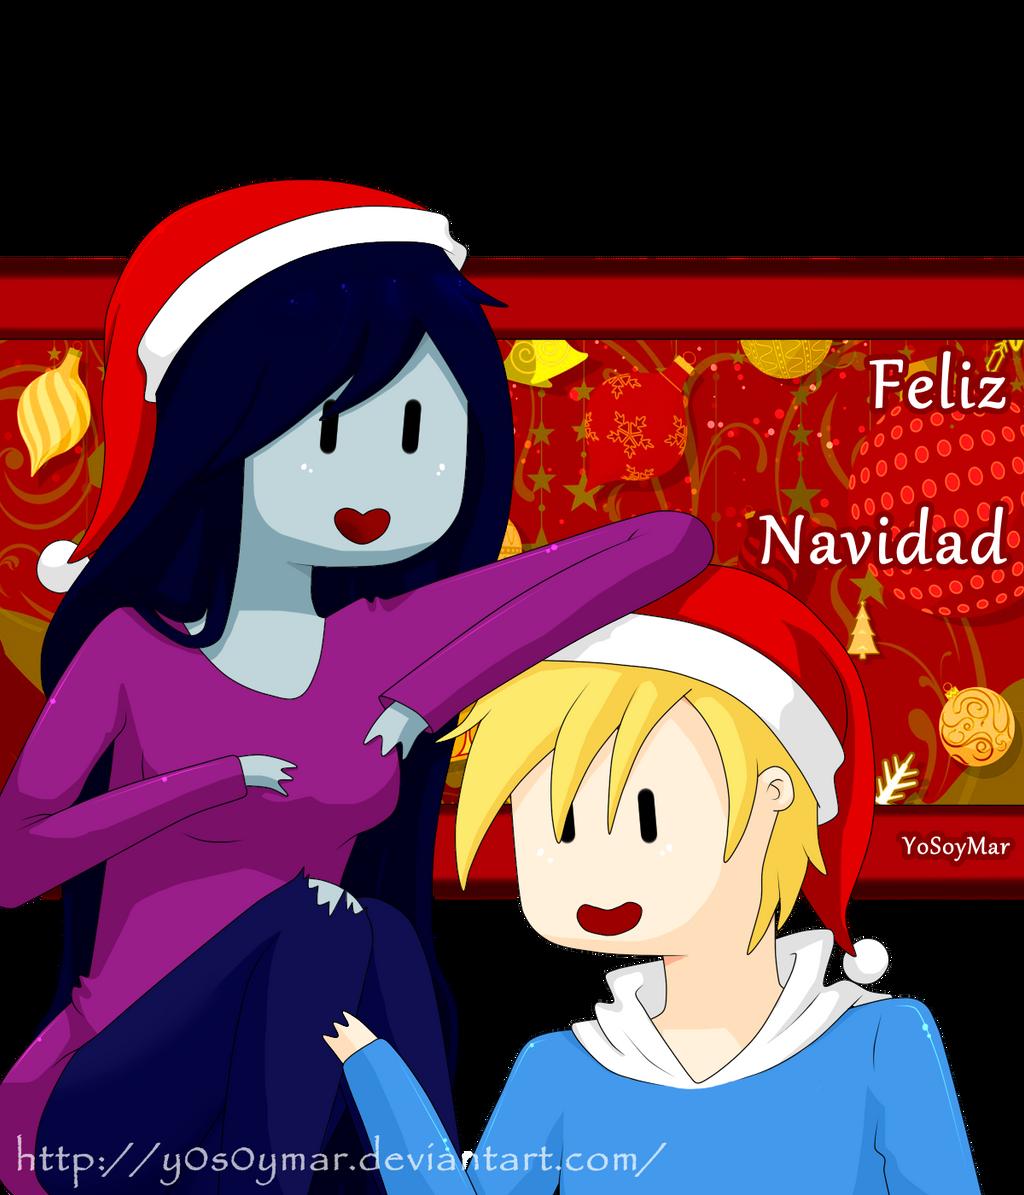 Feliz Navidad by Pandi-Mar